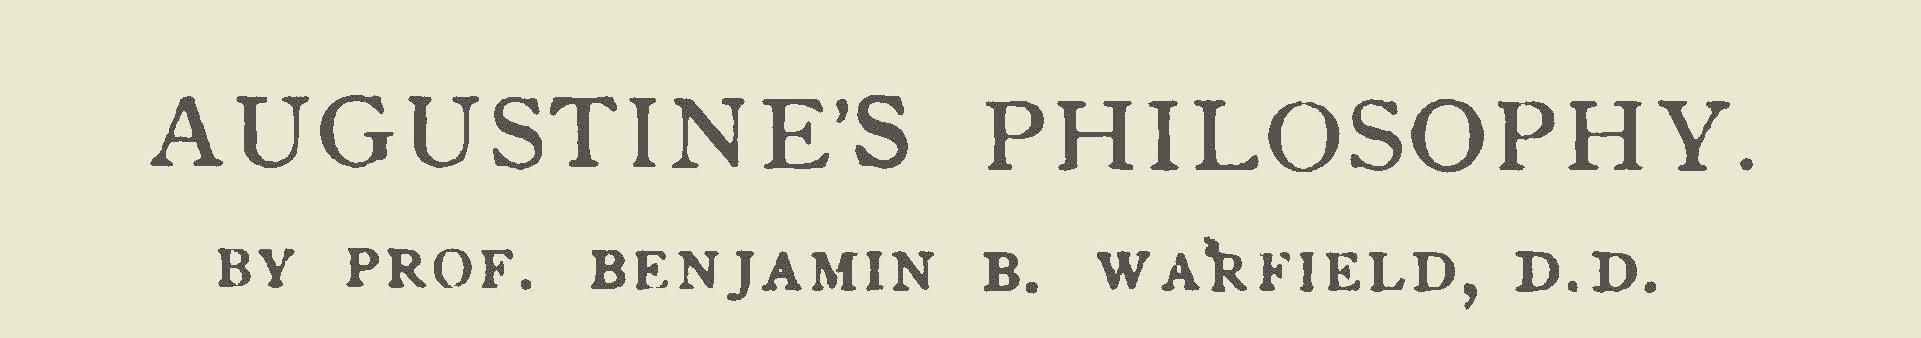 Warfield, Benjamin Breckinridge, Augustine's Philosophy Title Page.jpg